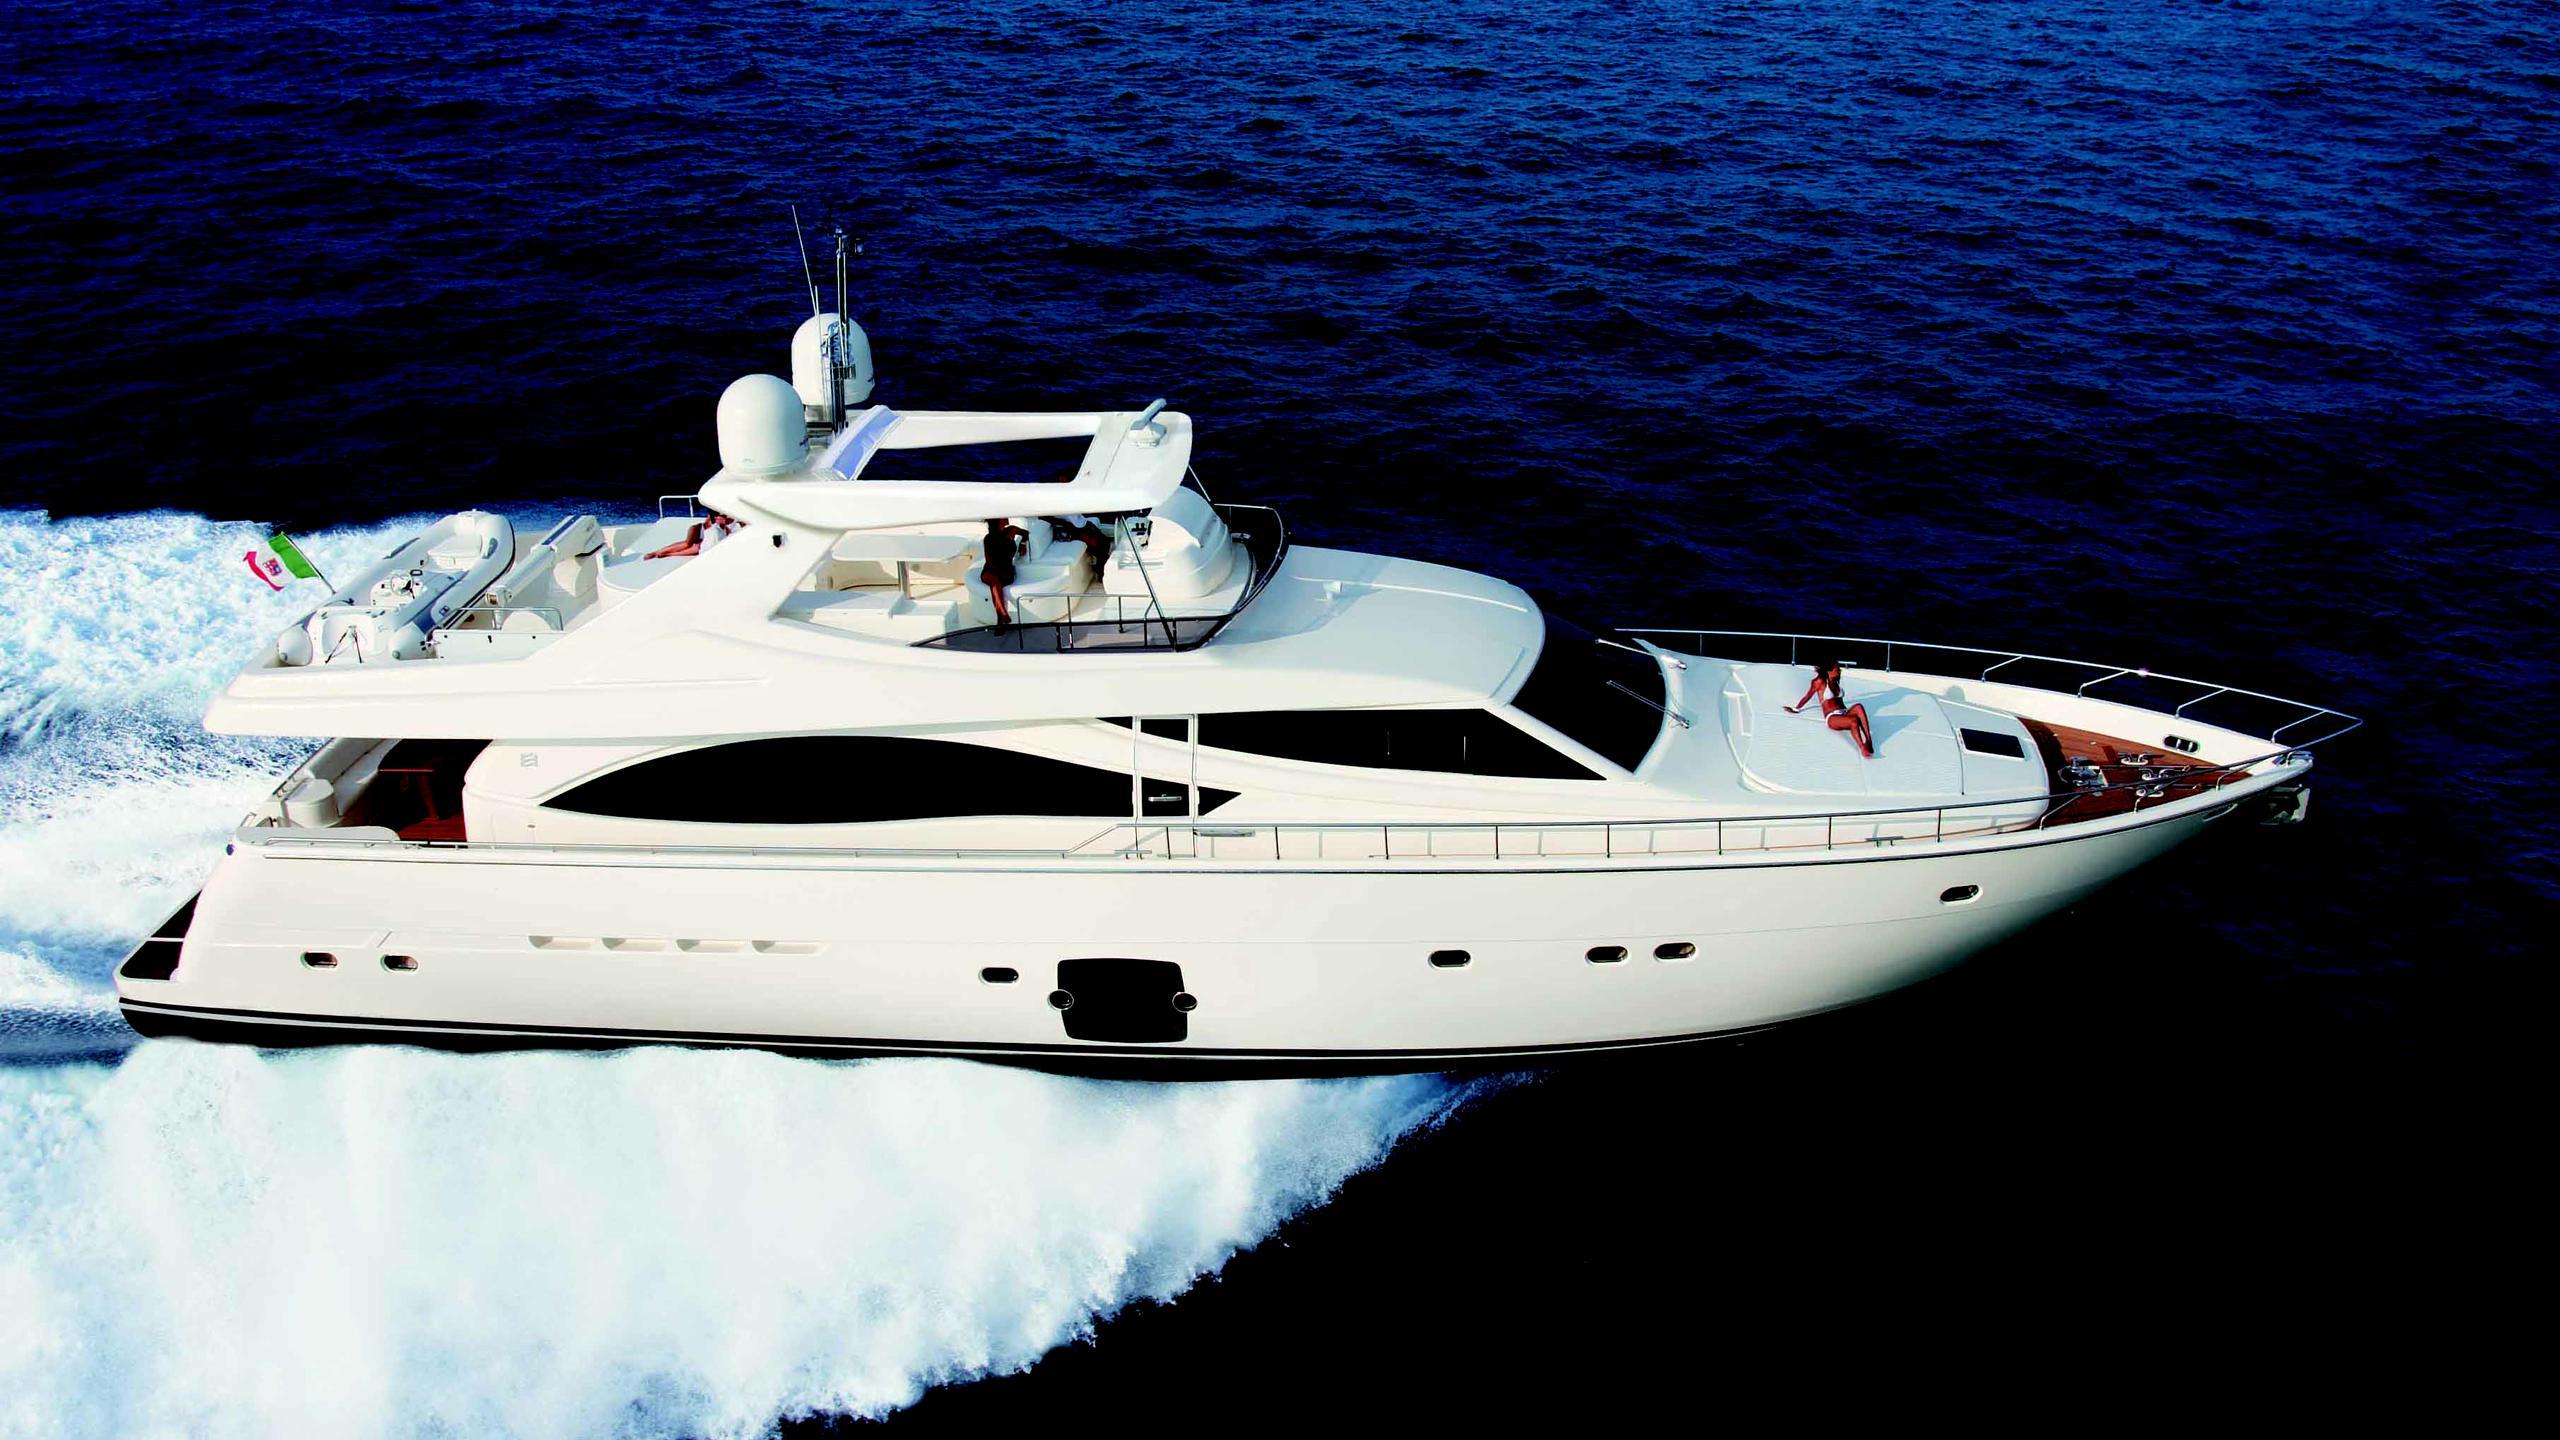 sabrina-motor-yacht-ferretti-830-2006-25m-cruising